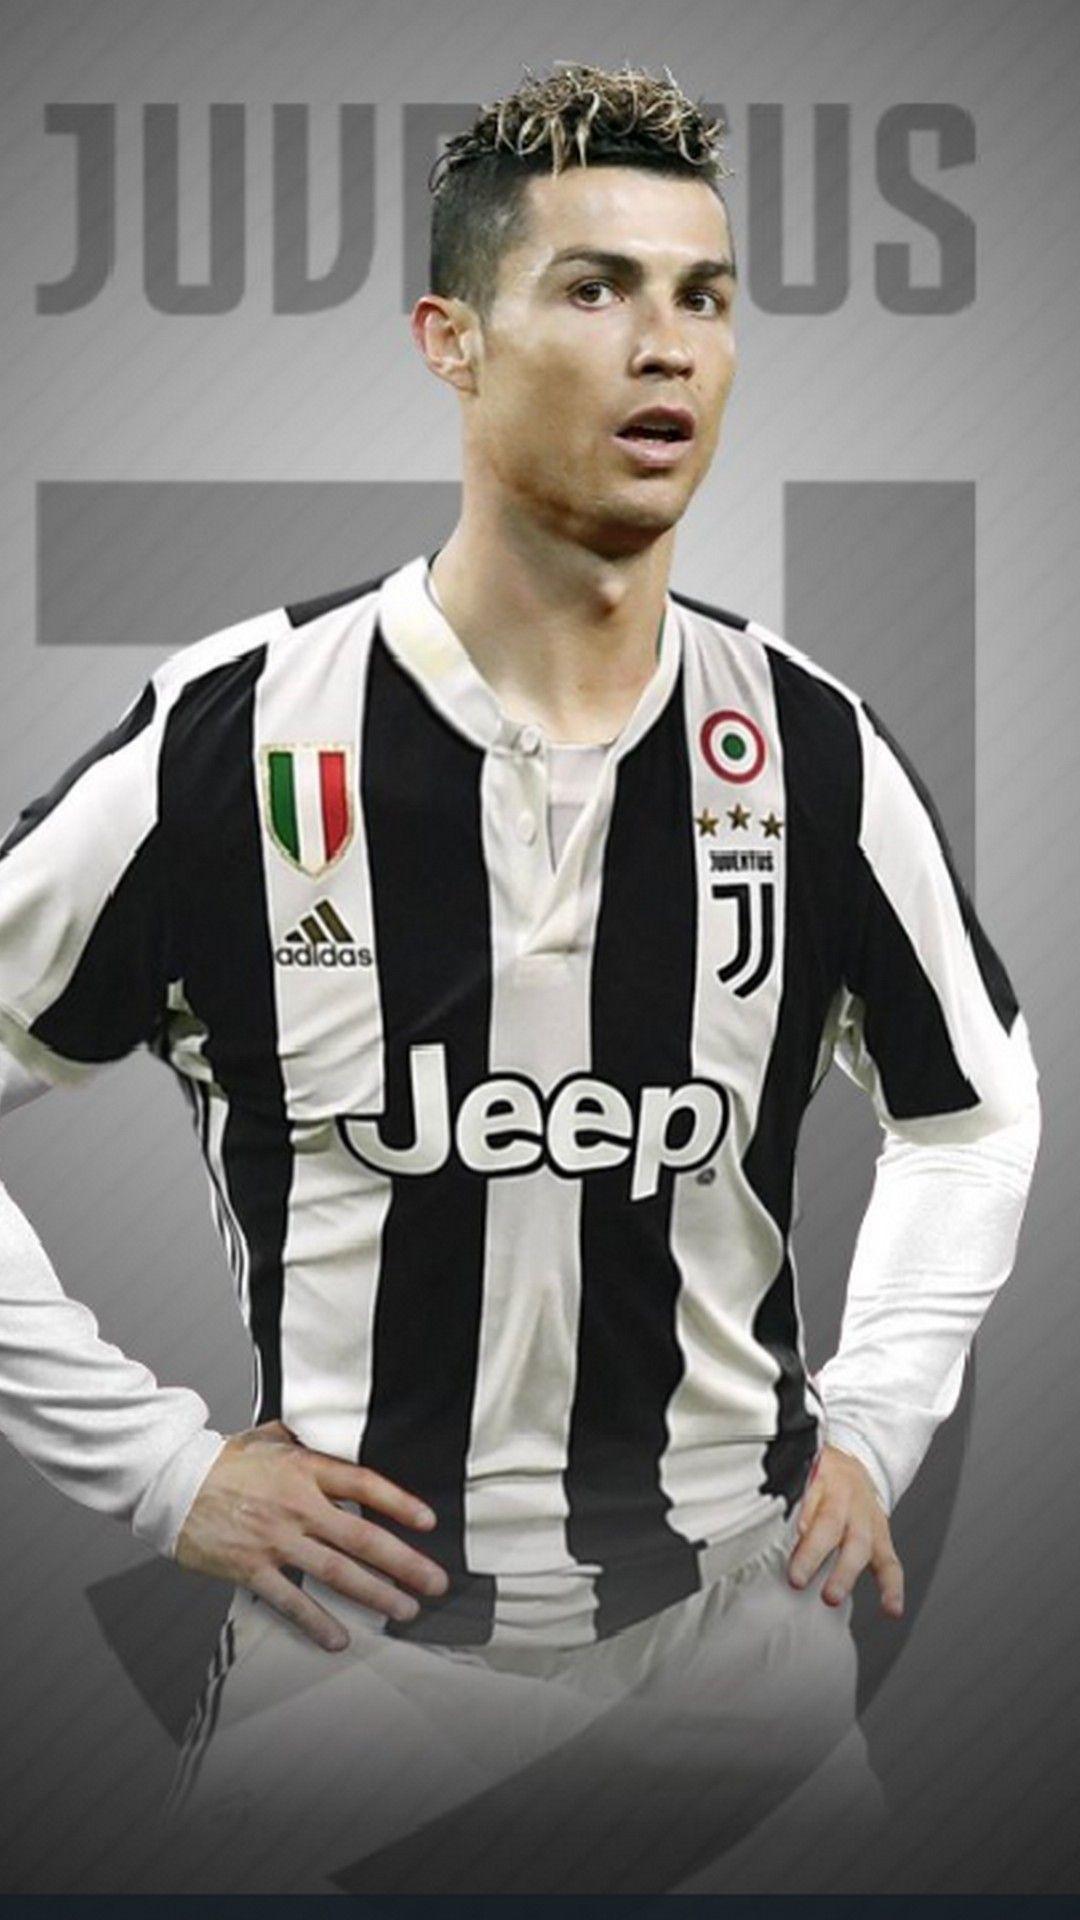 Wallpaper Cristiano Ronaldo Juventus Android 2019